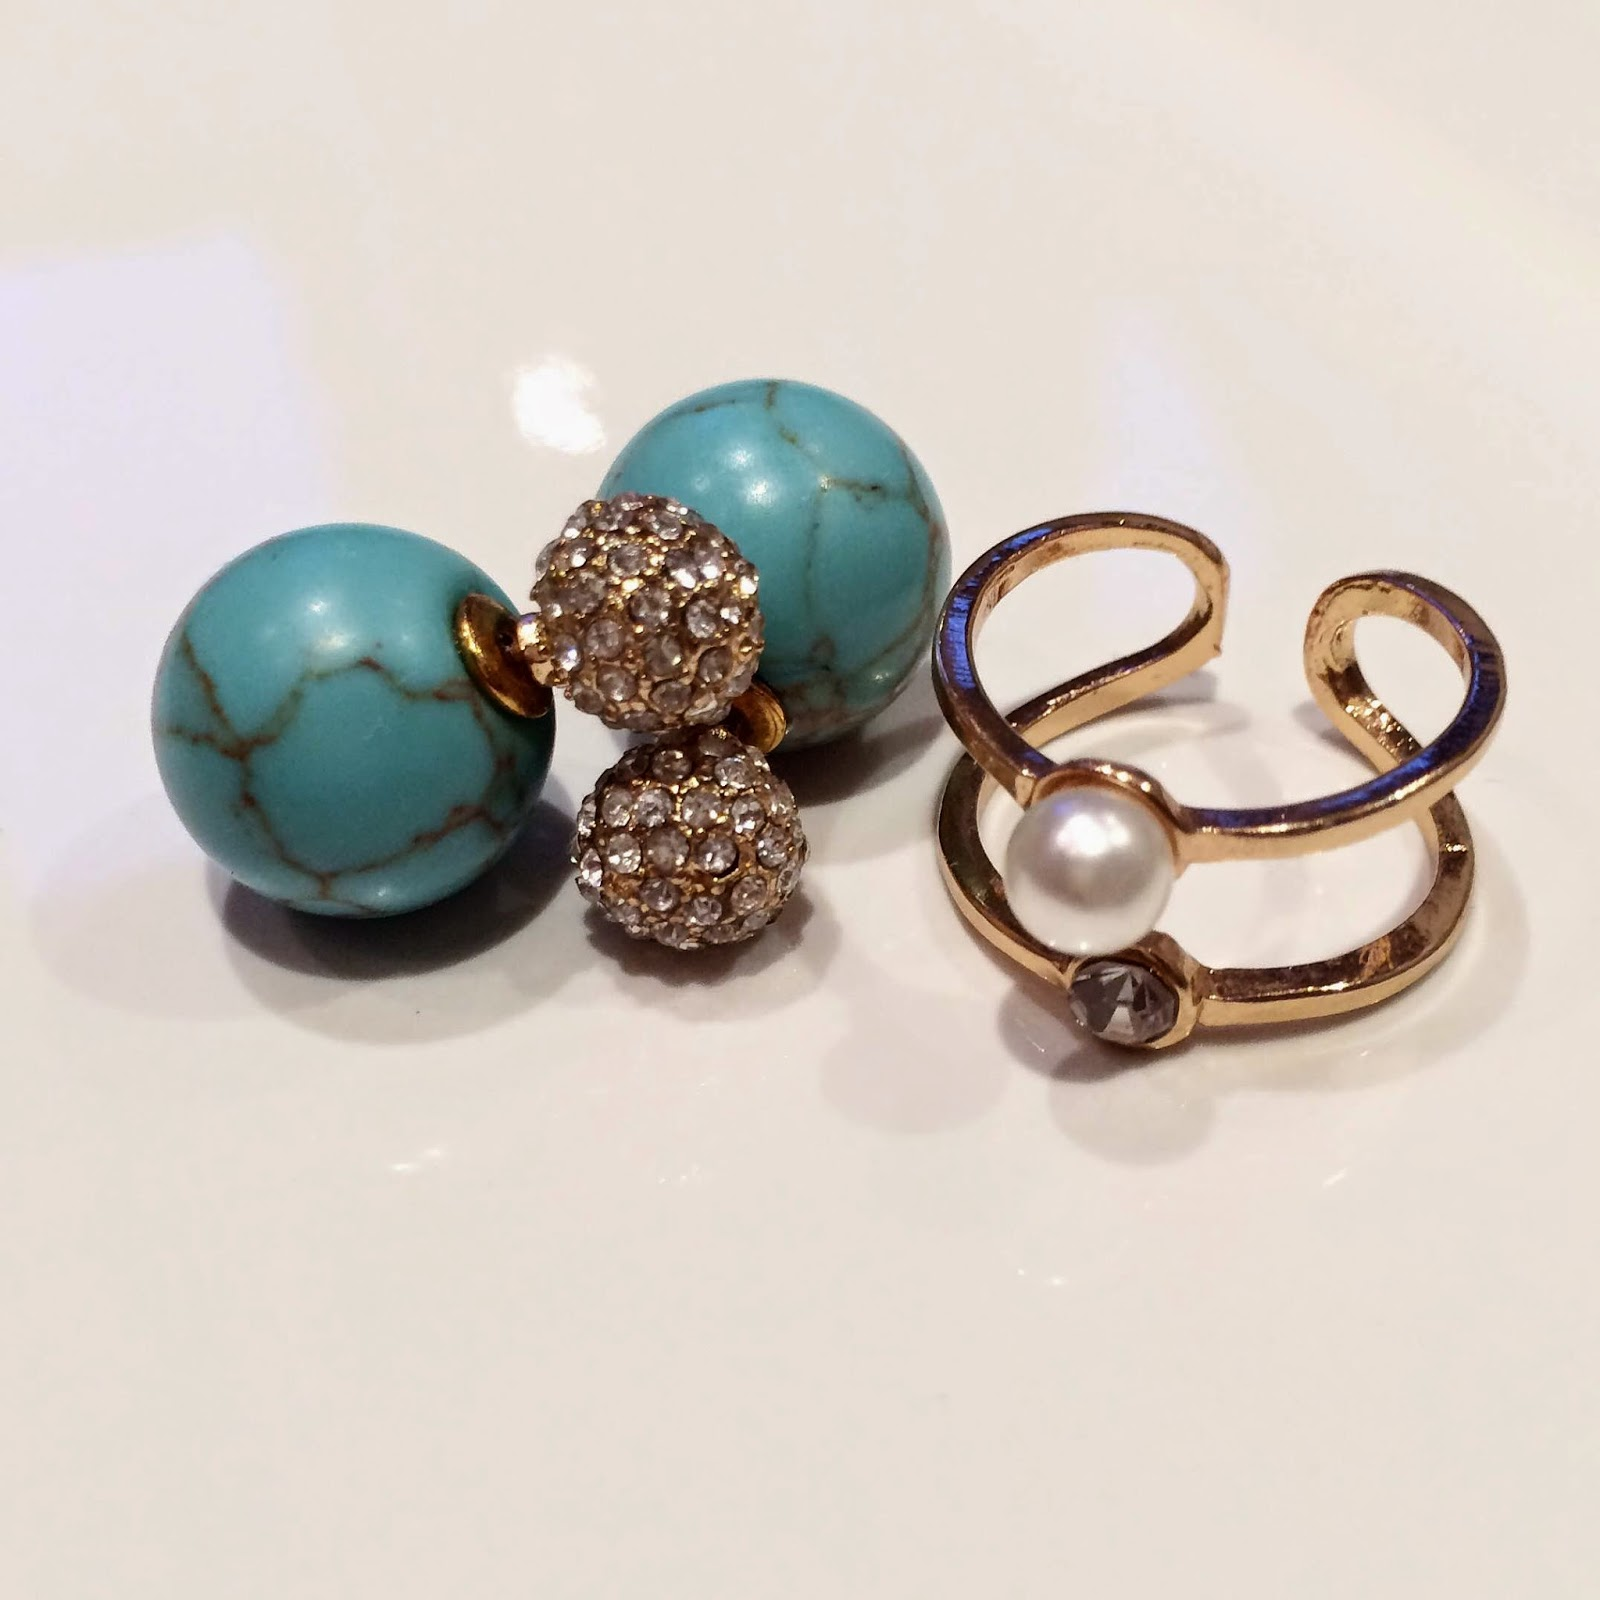 east-urban-double-pearl-earrings-gold-pearl-ring